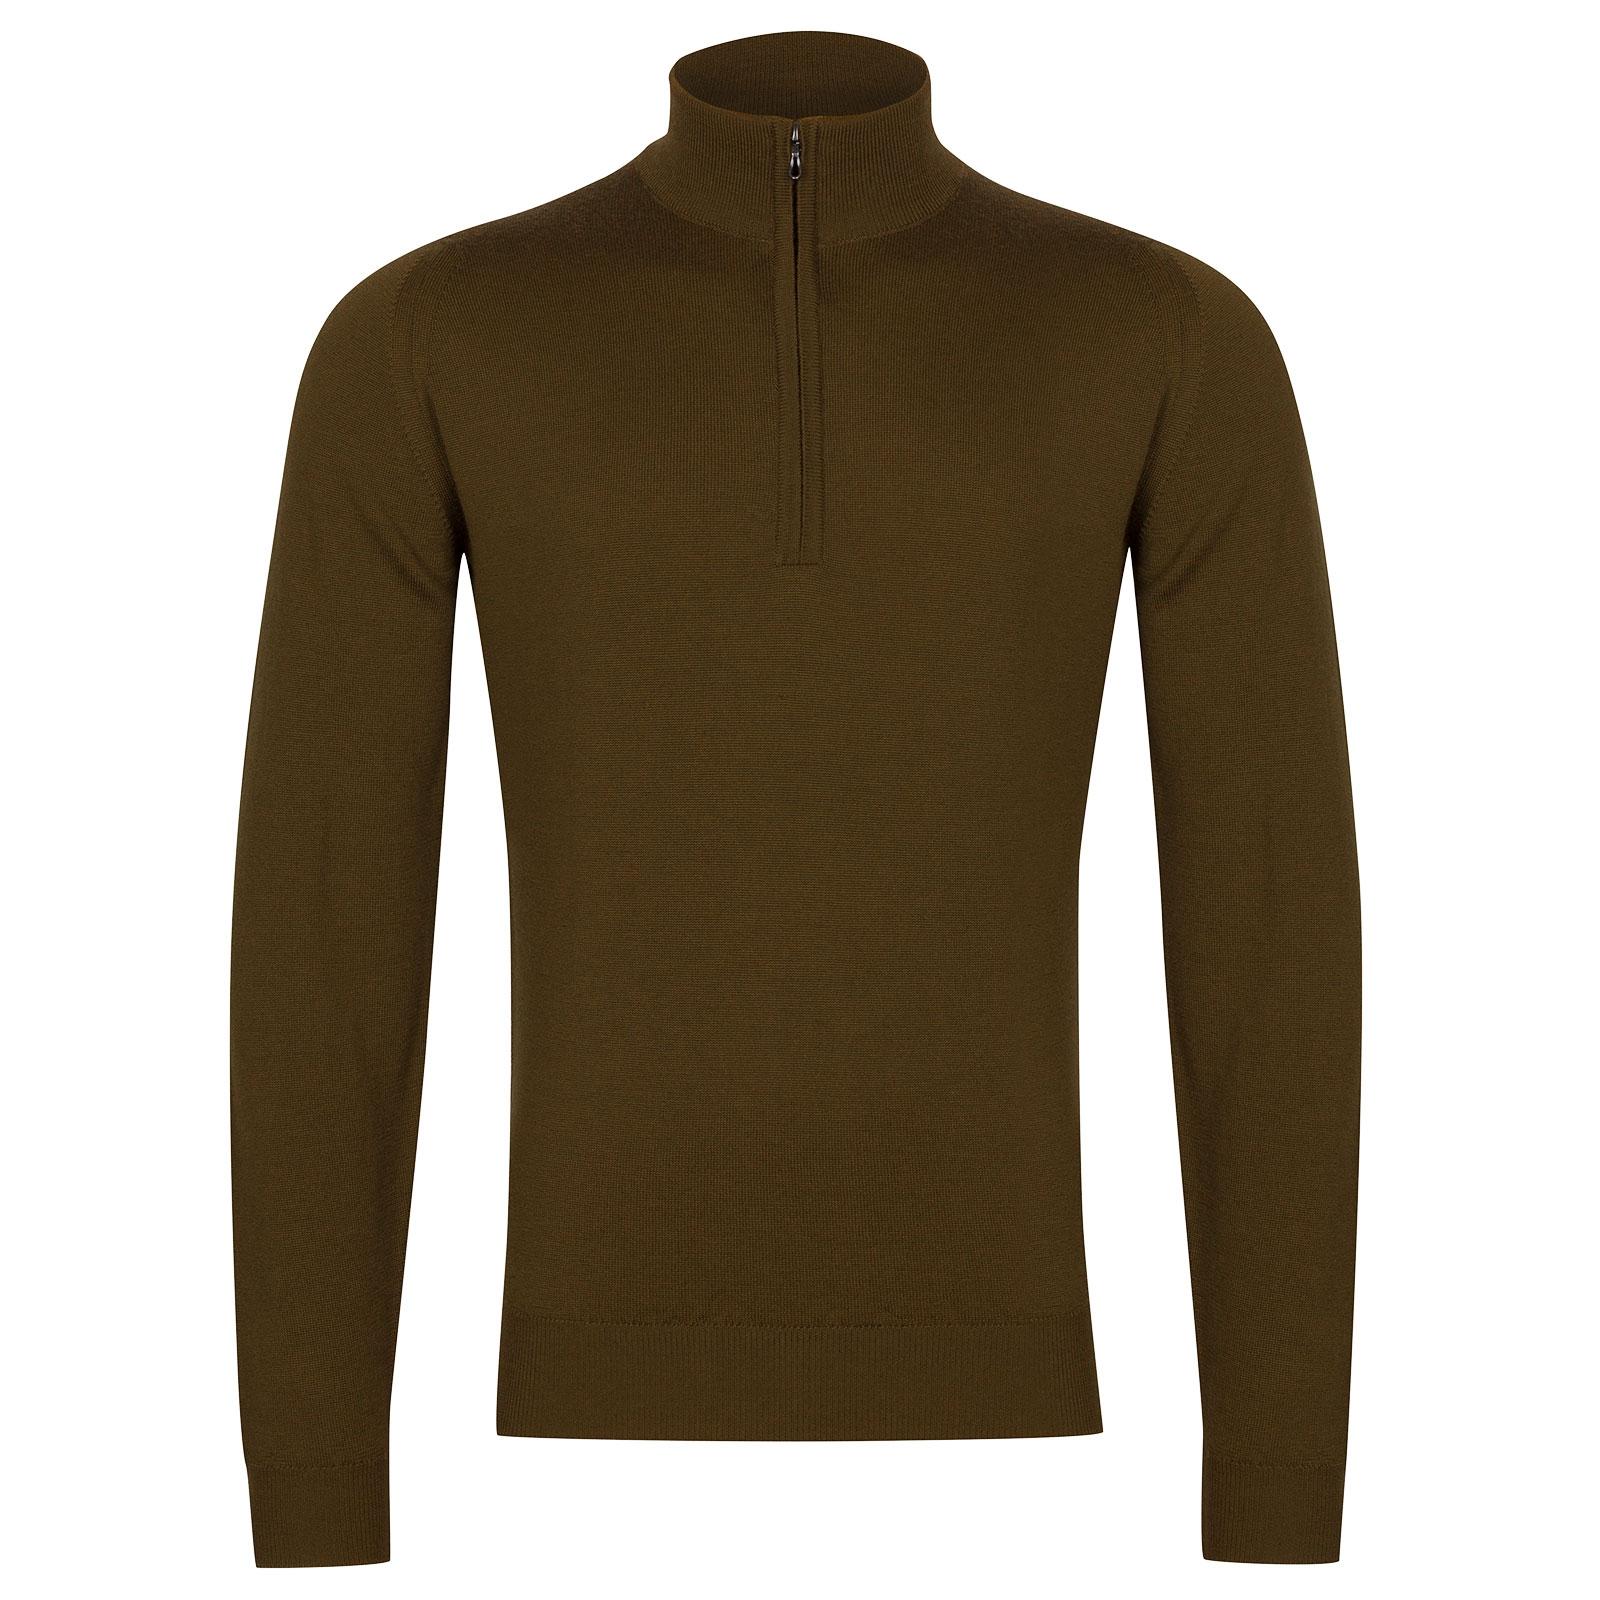 John Smedley Tapton Merino Wool Pullover in Khaki-M